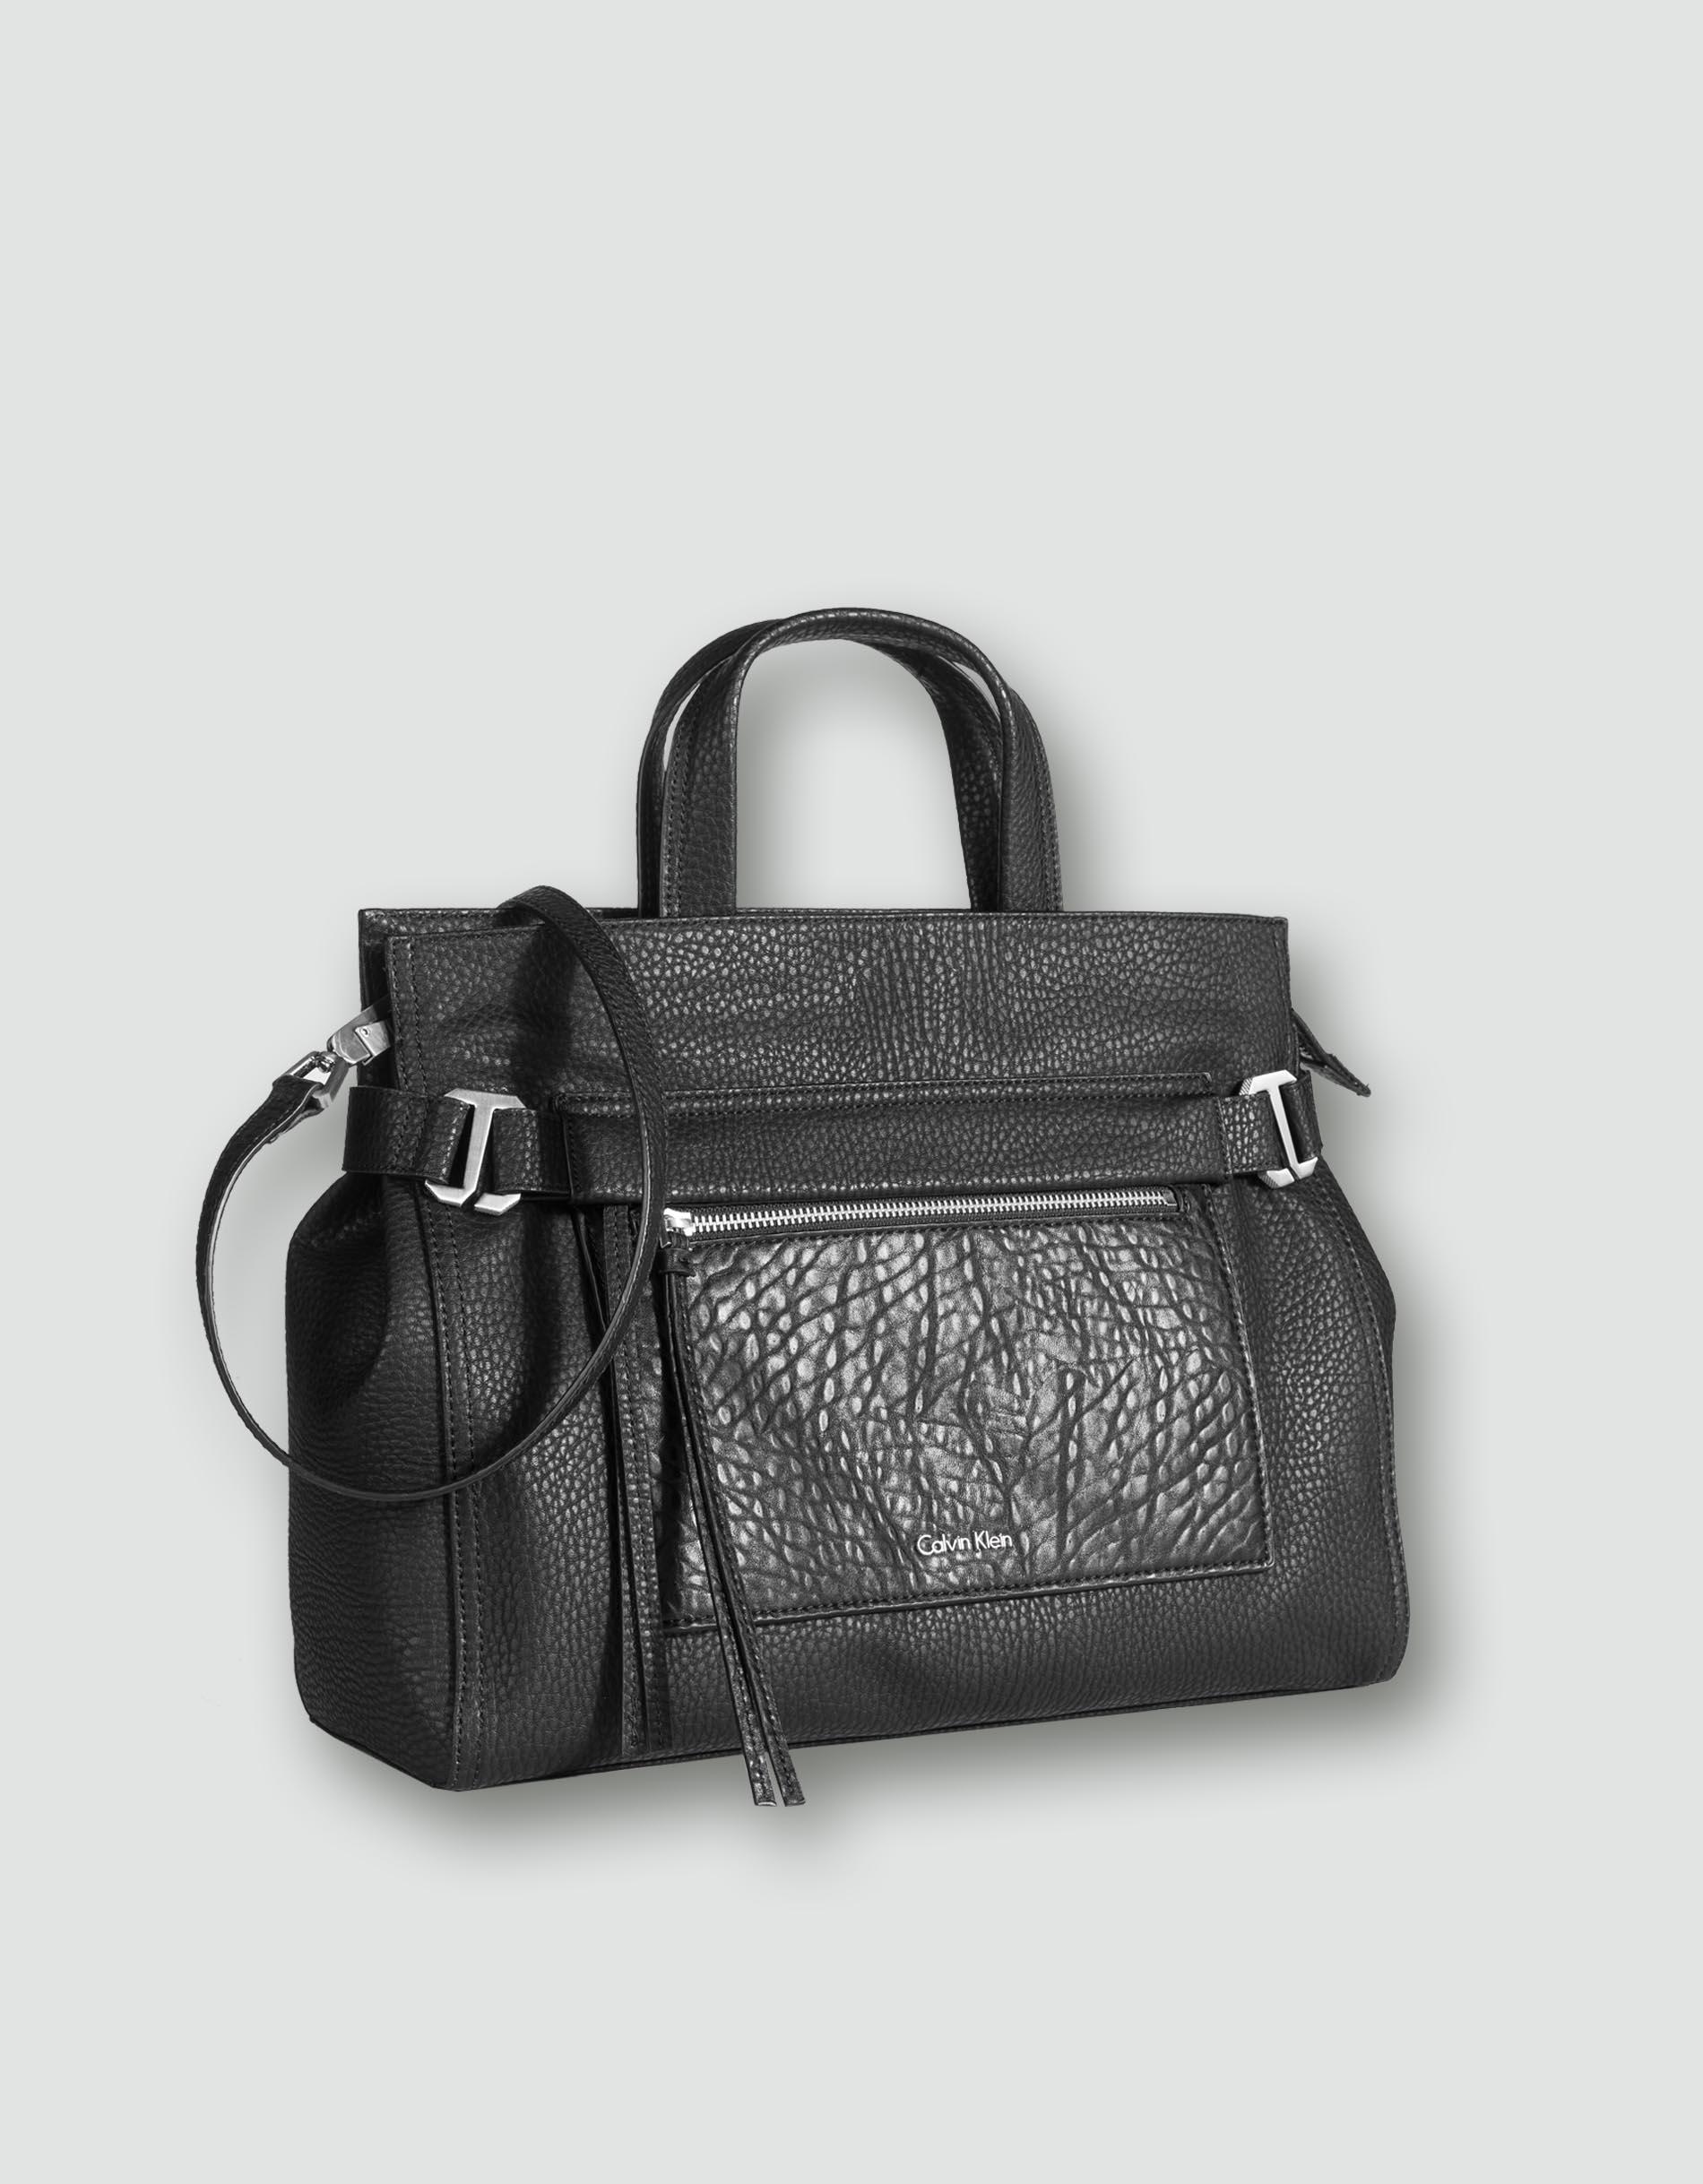 calvin klein jeans damen tasche tote bag mit abnehmbarer. Black Bedroom Furniture Sets. Home Design Ideas